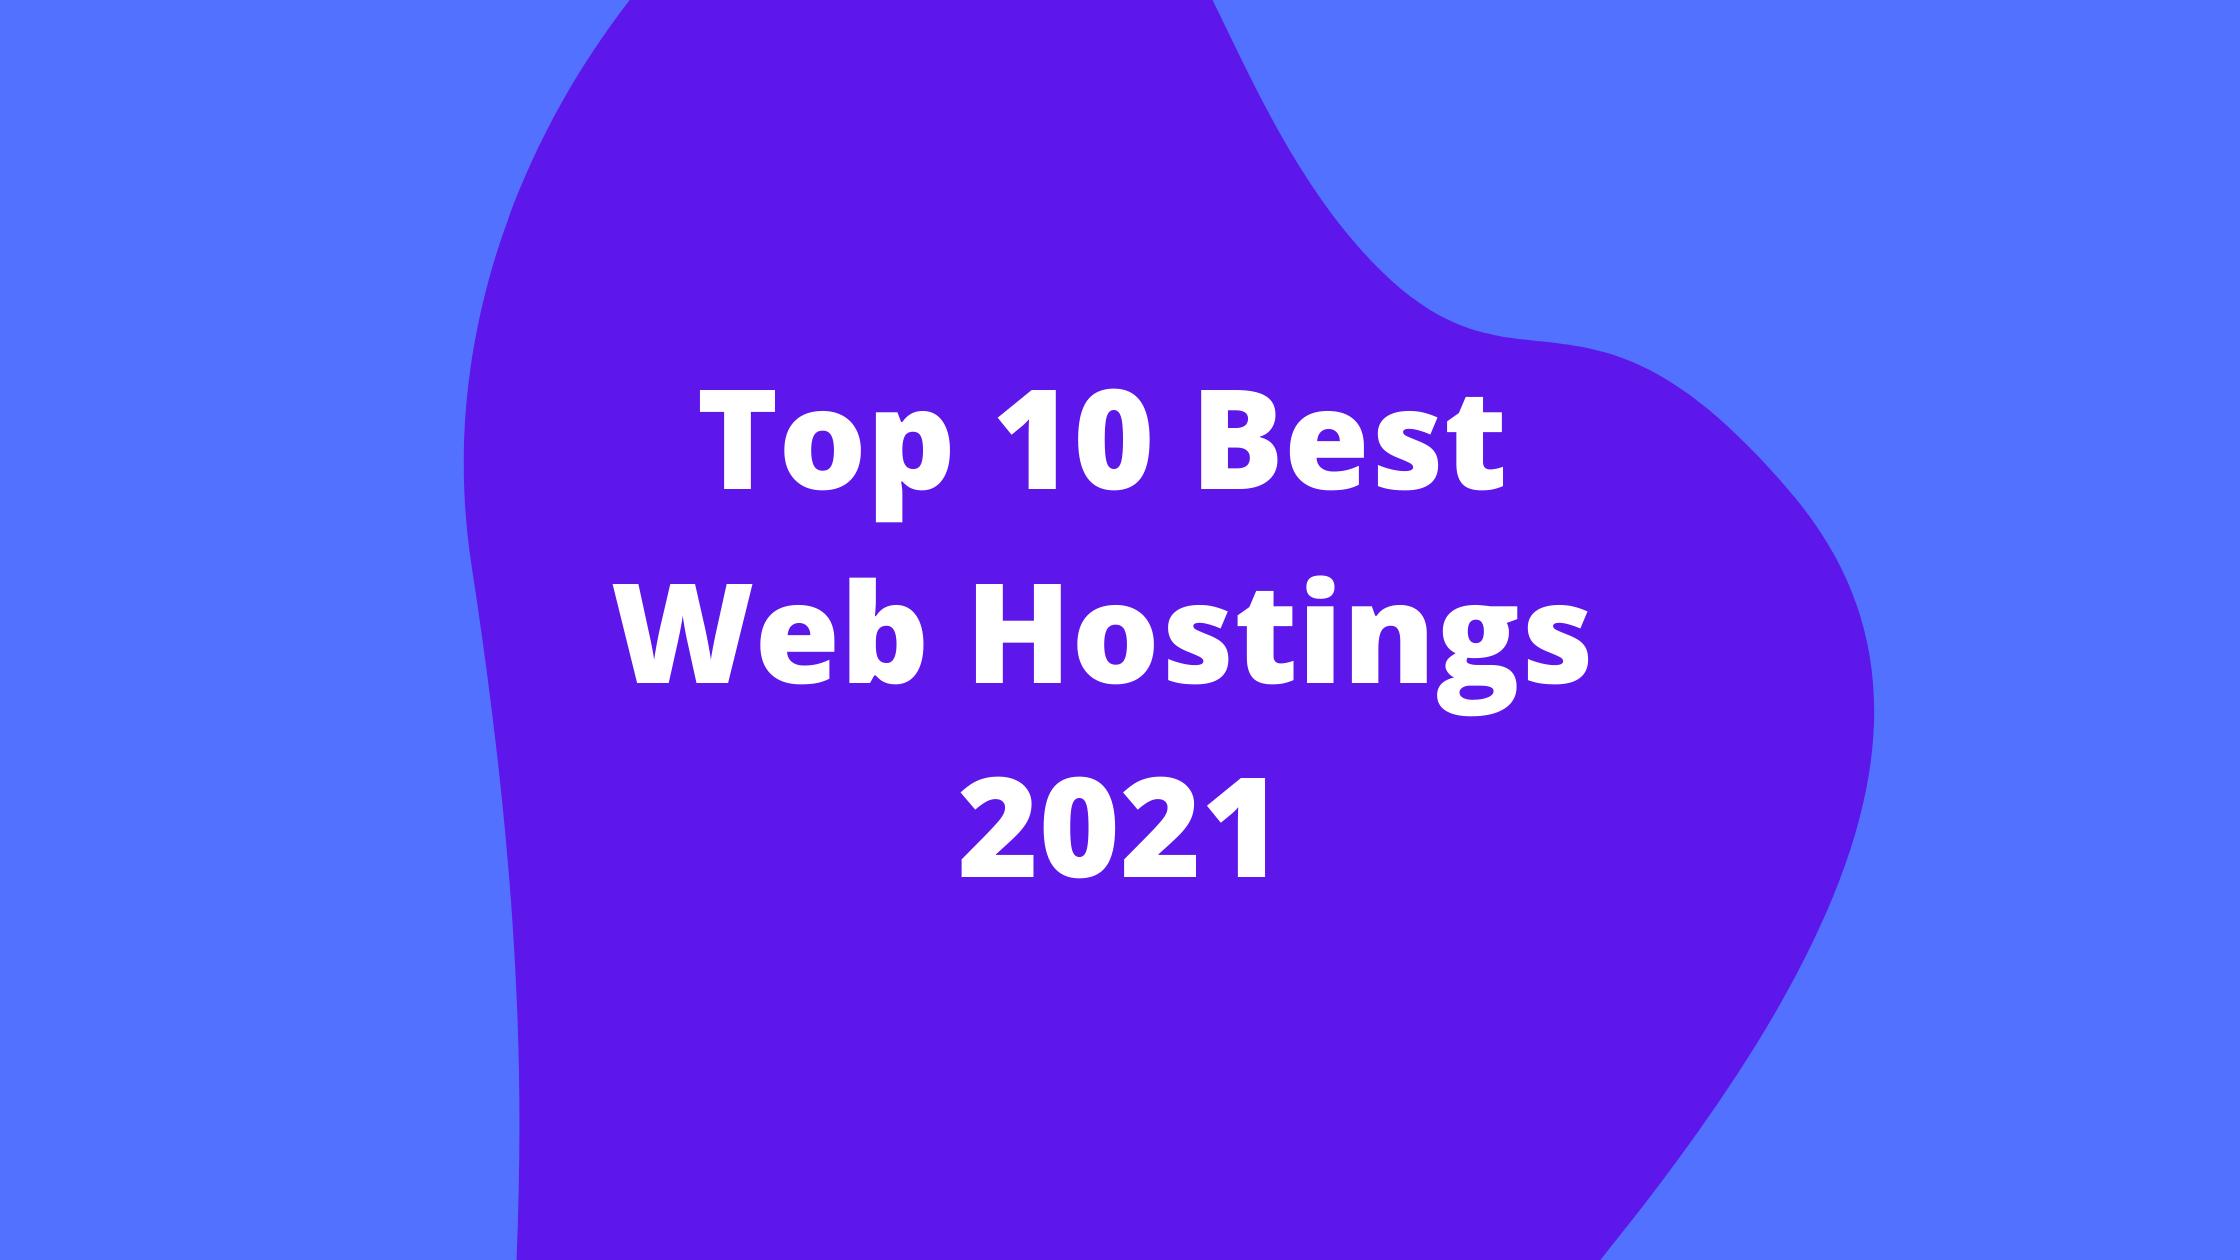 top 10 best web hosting in india 2021